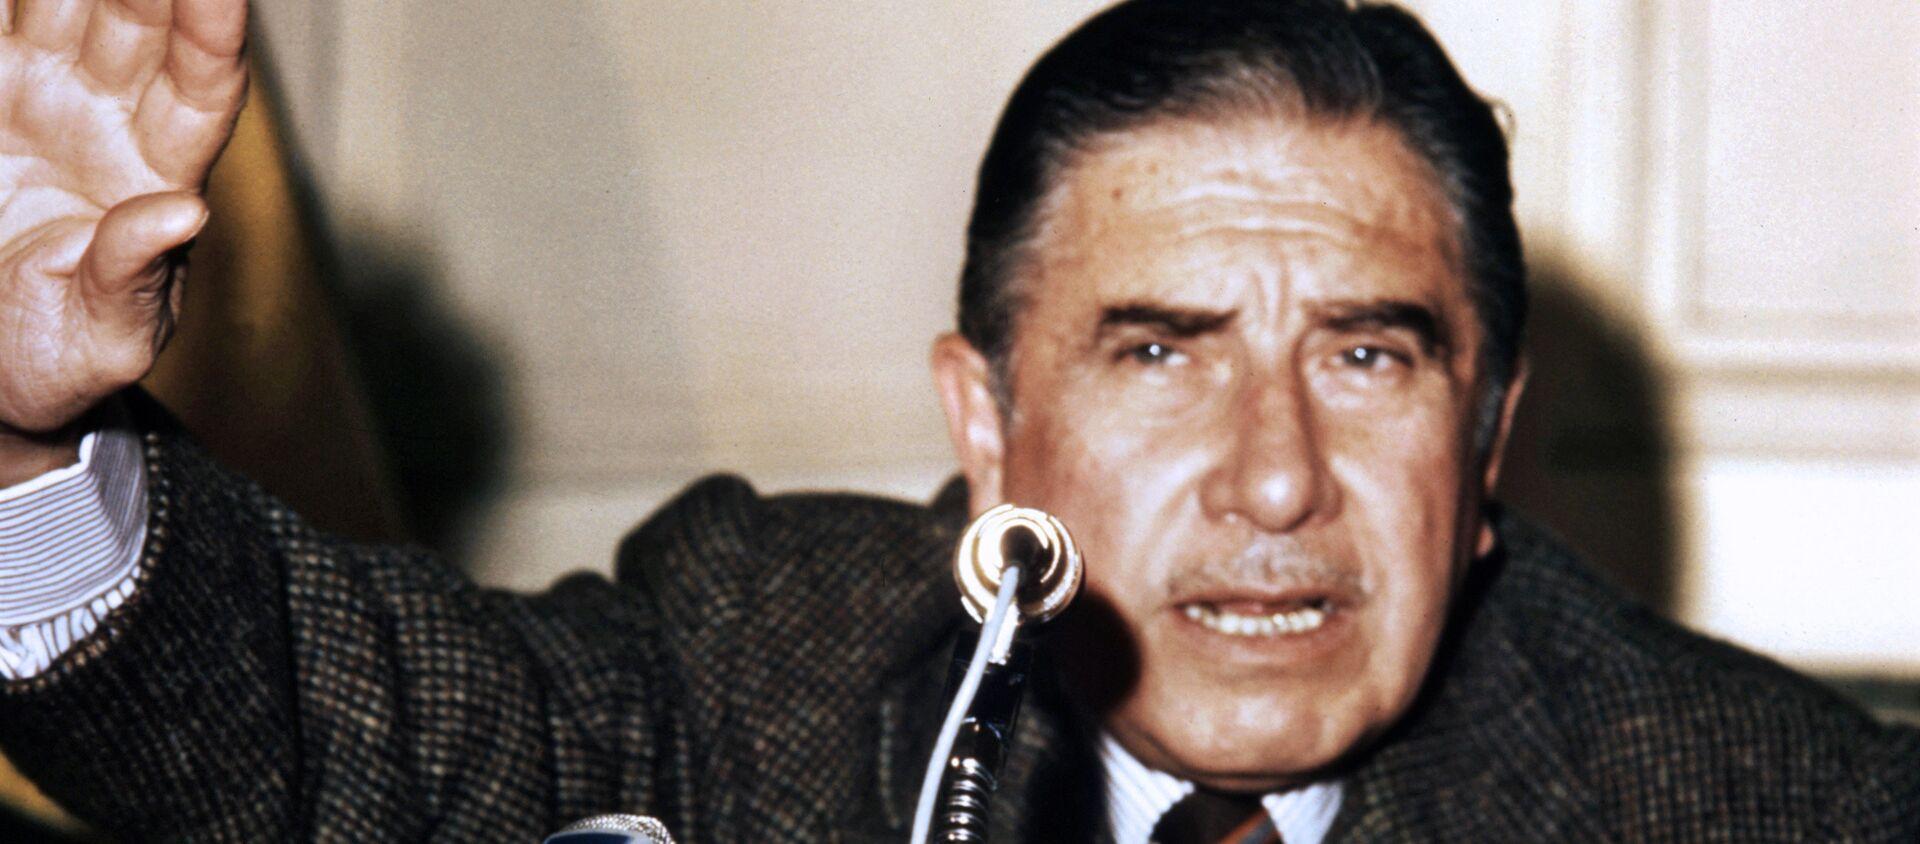 Augusto Pinochet, dictador chileno (archivo) - Sputnik Mundo, 1920, 31.08.2019